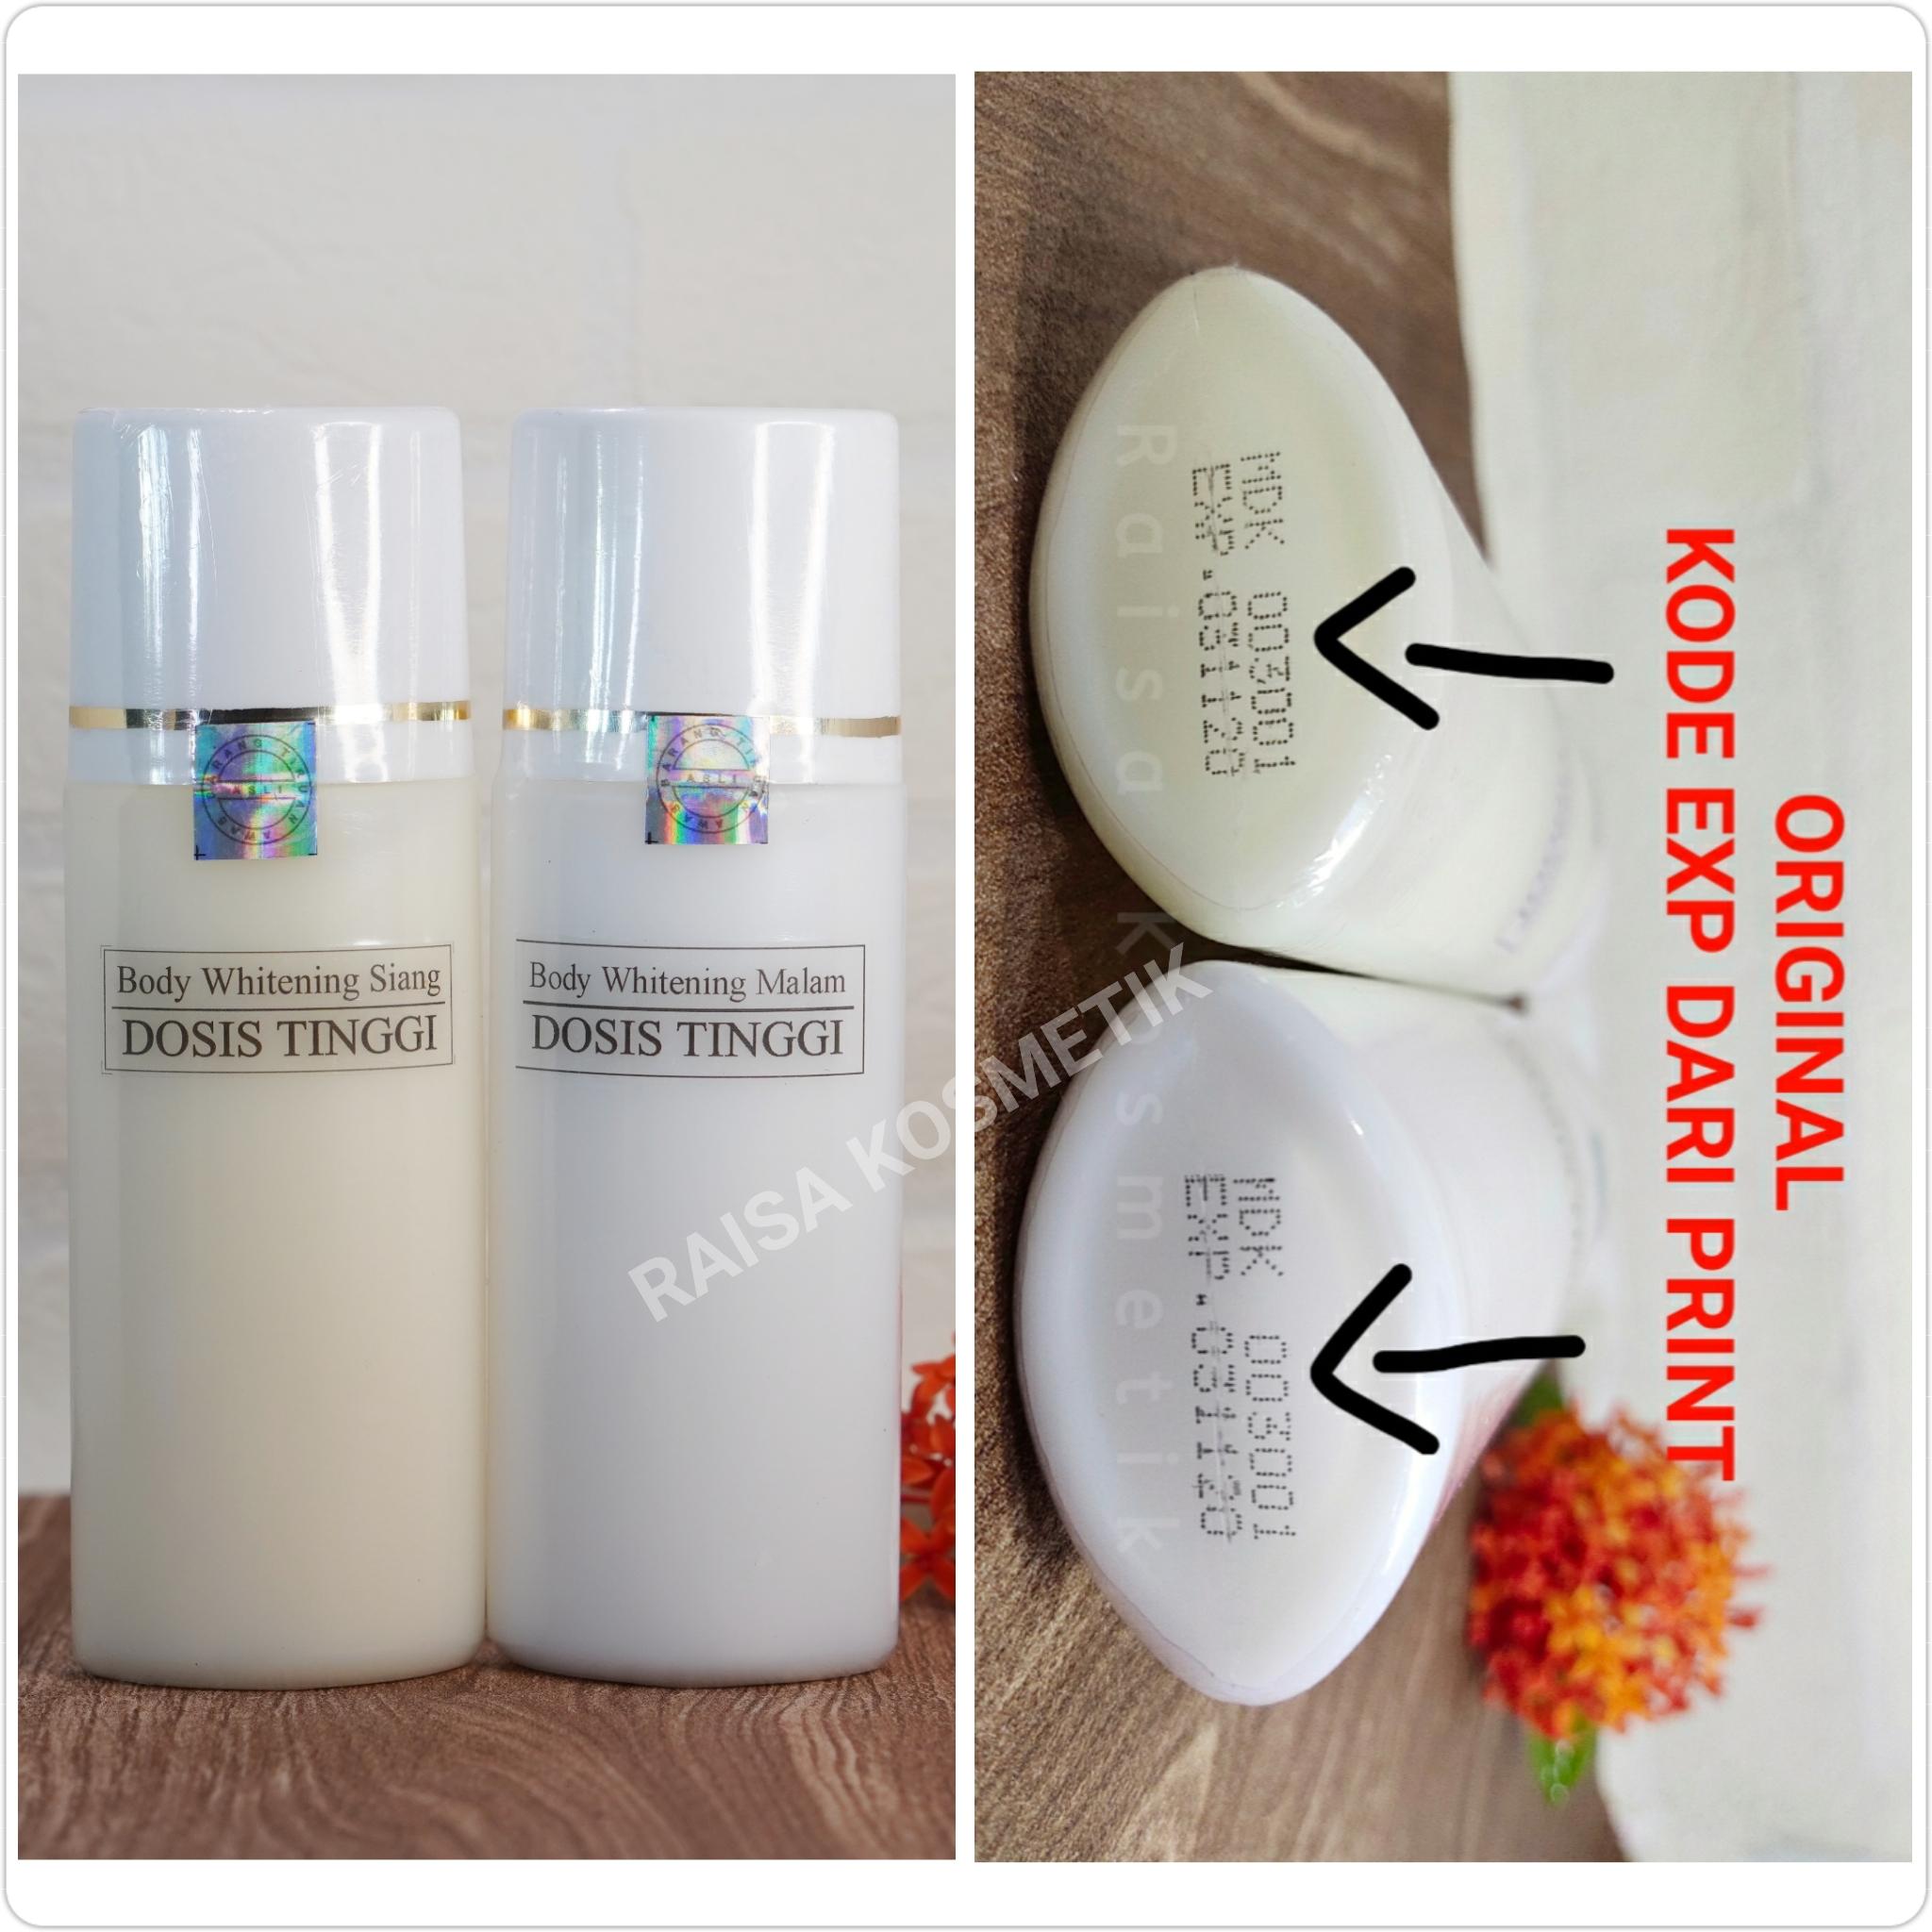 [siang & malam] hb extra whitening dosis tinggi / body whitening / body lotion / lotion / handbody / pemutih ba/ whitening